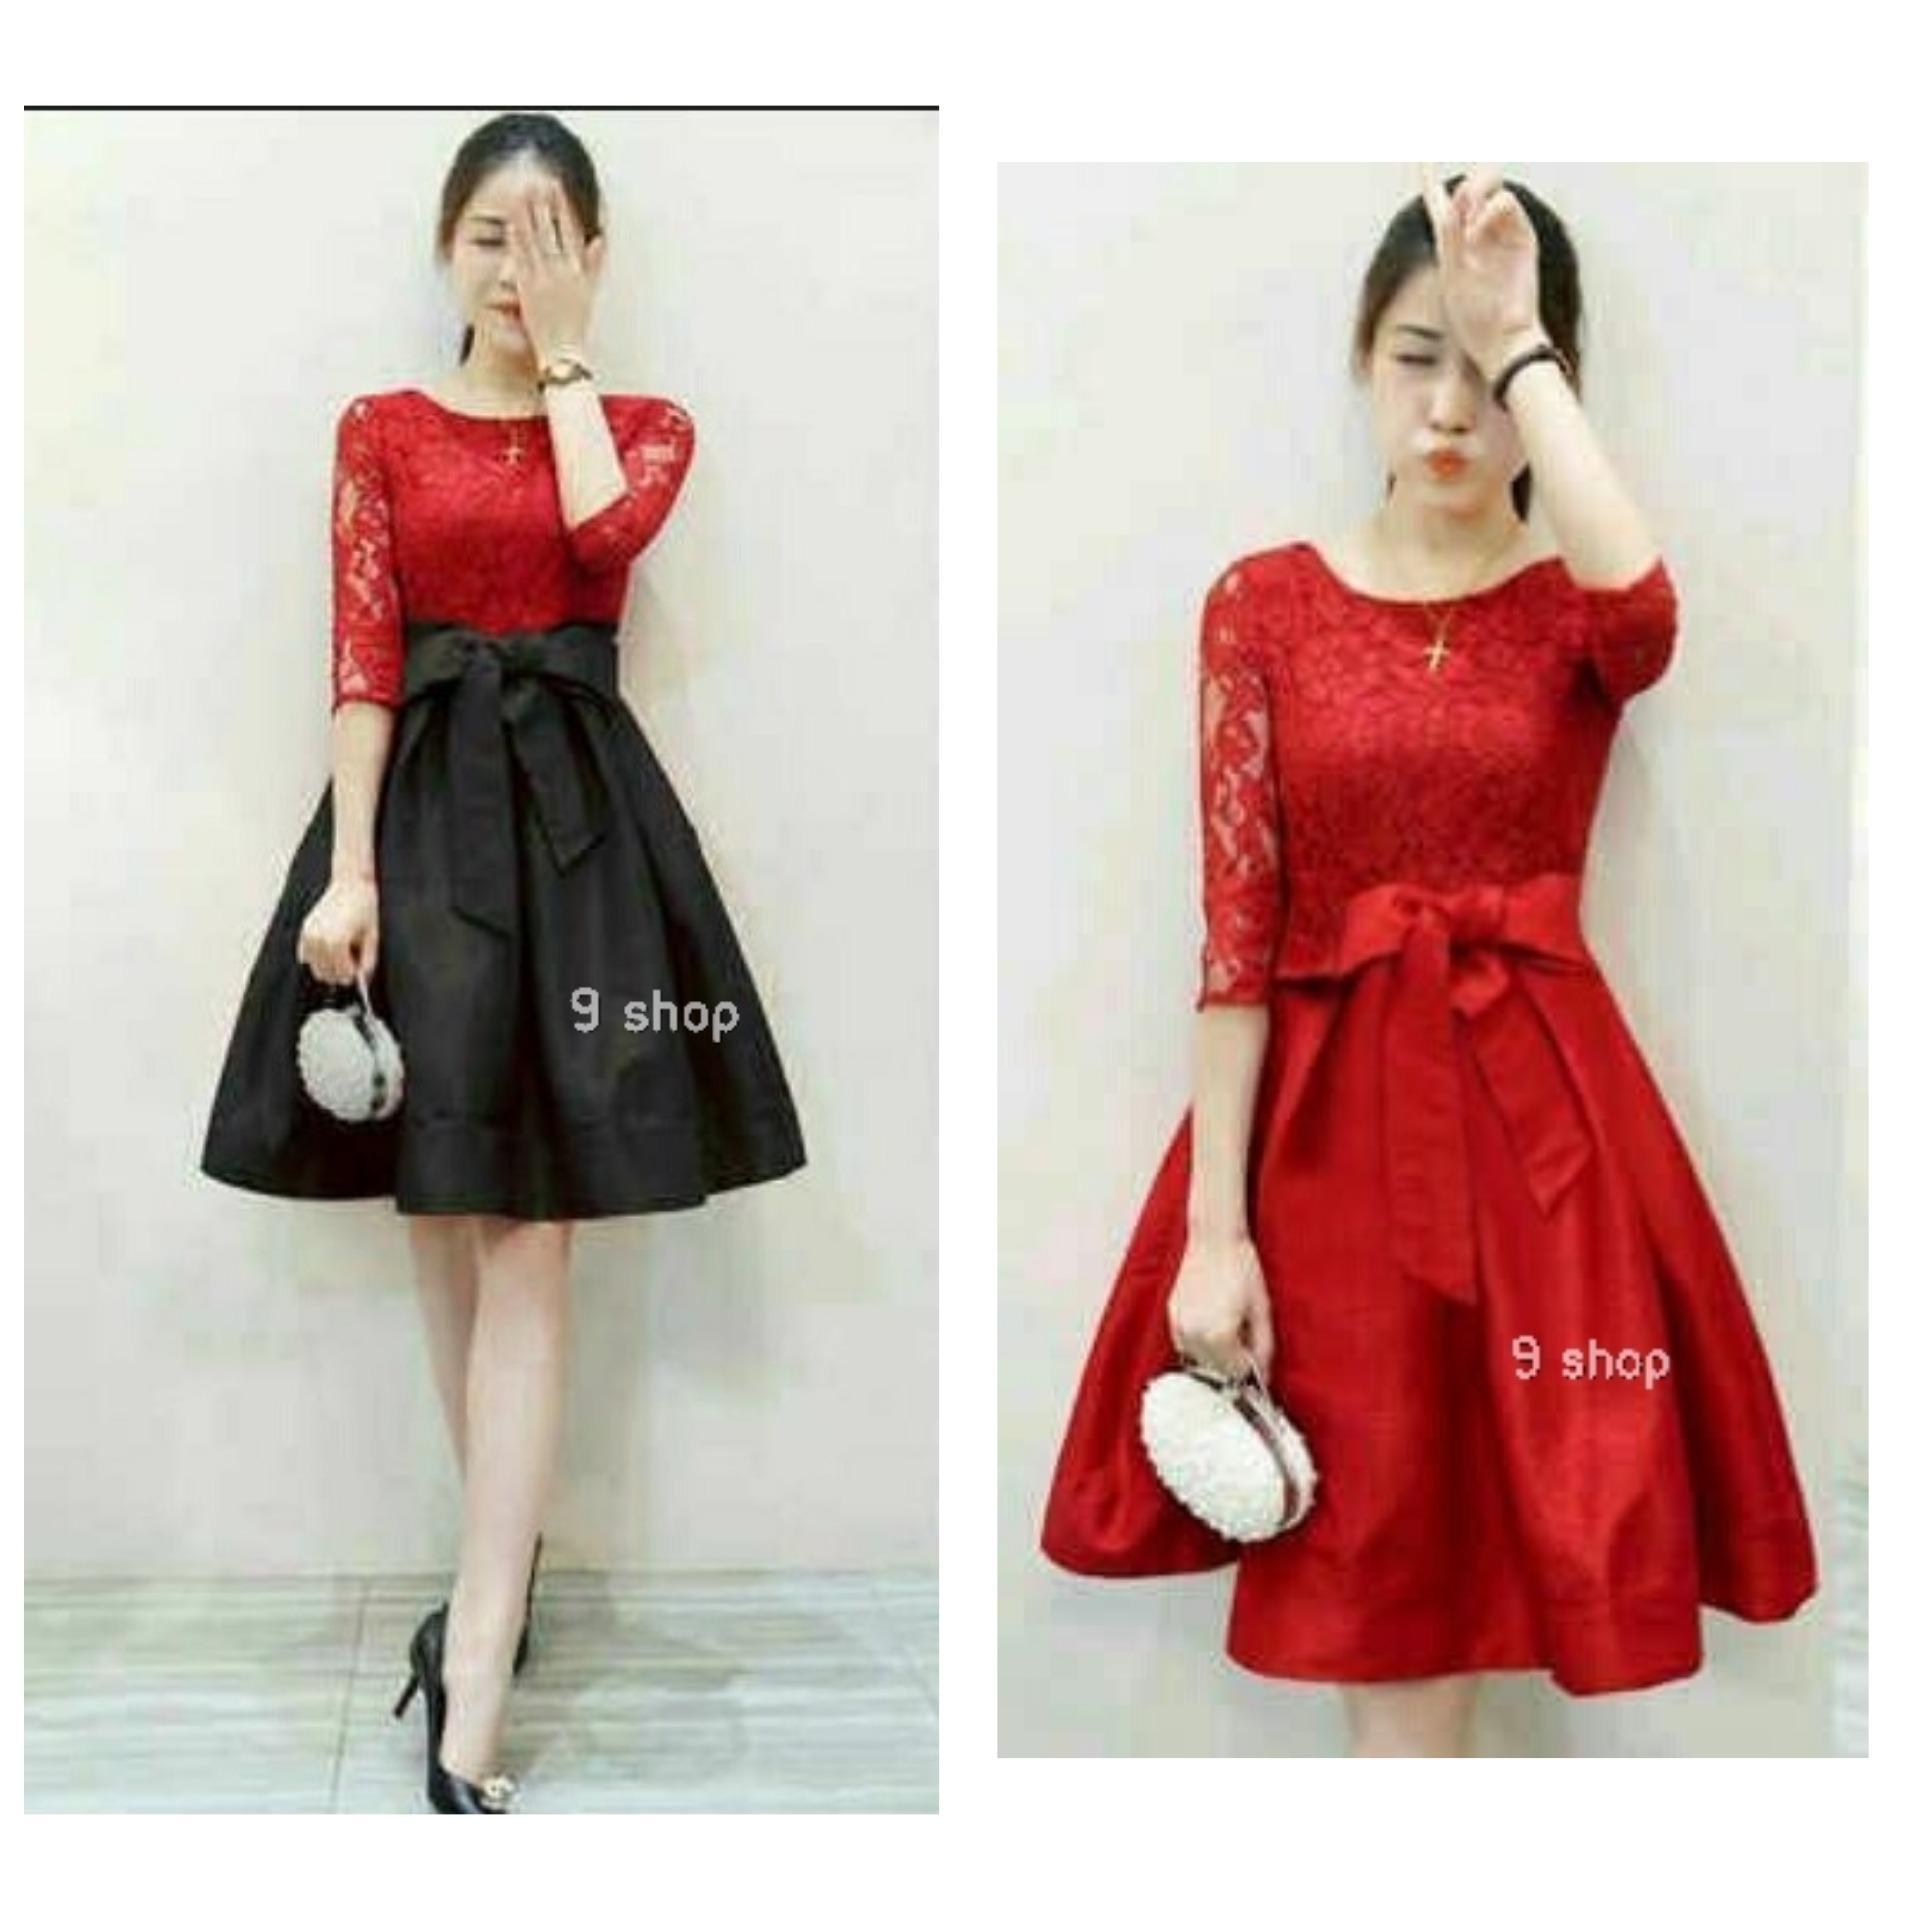 9 Shop Dress Brukat Wanita MERLI / Dress Korea / Dress Renda / Lace Dress / Gaun Pesta / Gaun Midi / Gaun Murah / Gaun Murah / Dress Cewek / Gaun Remaja